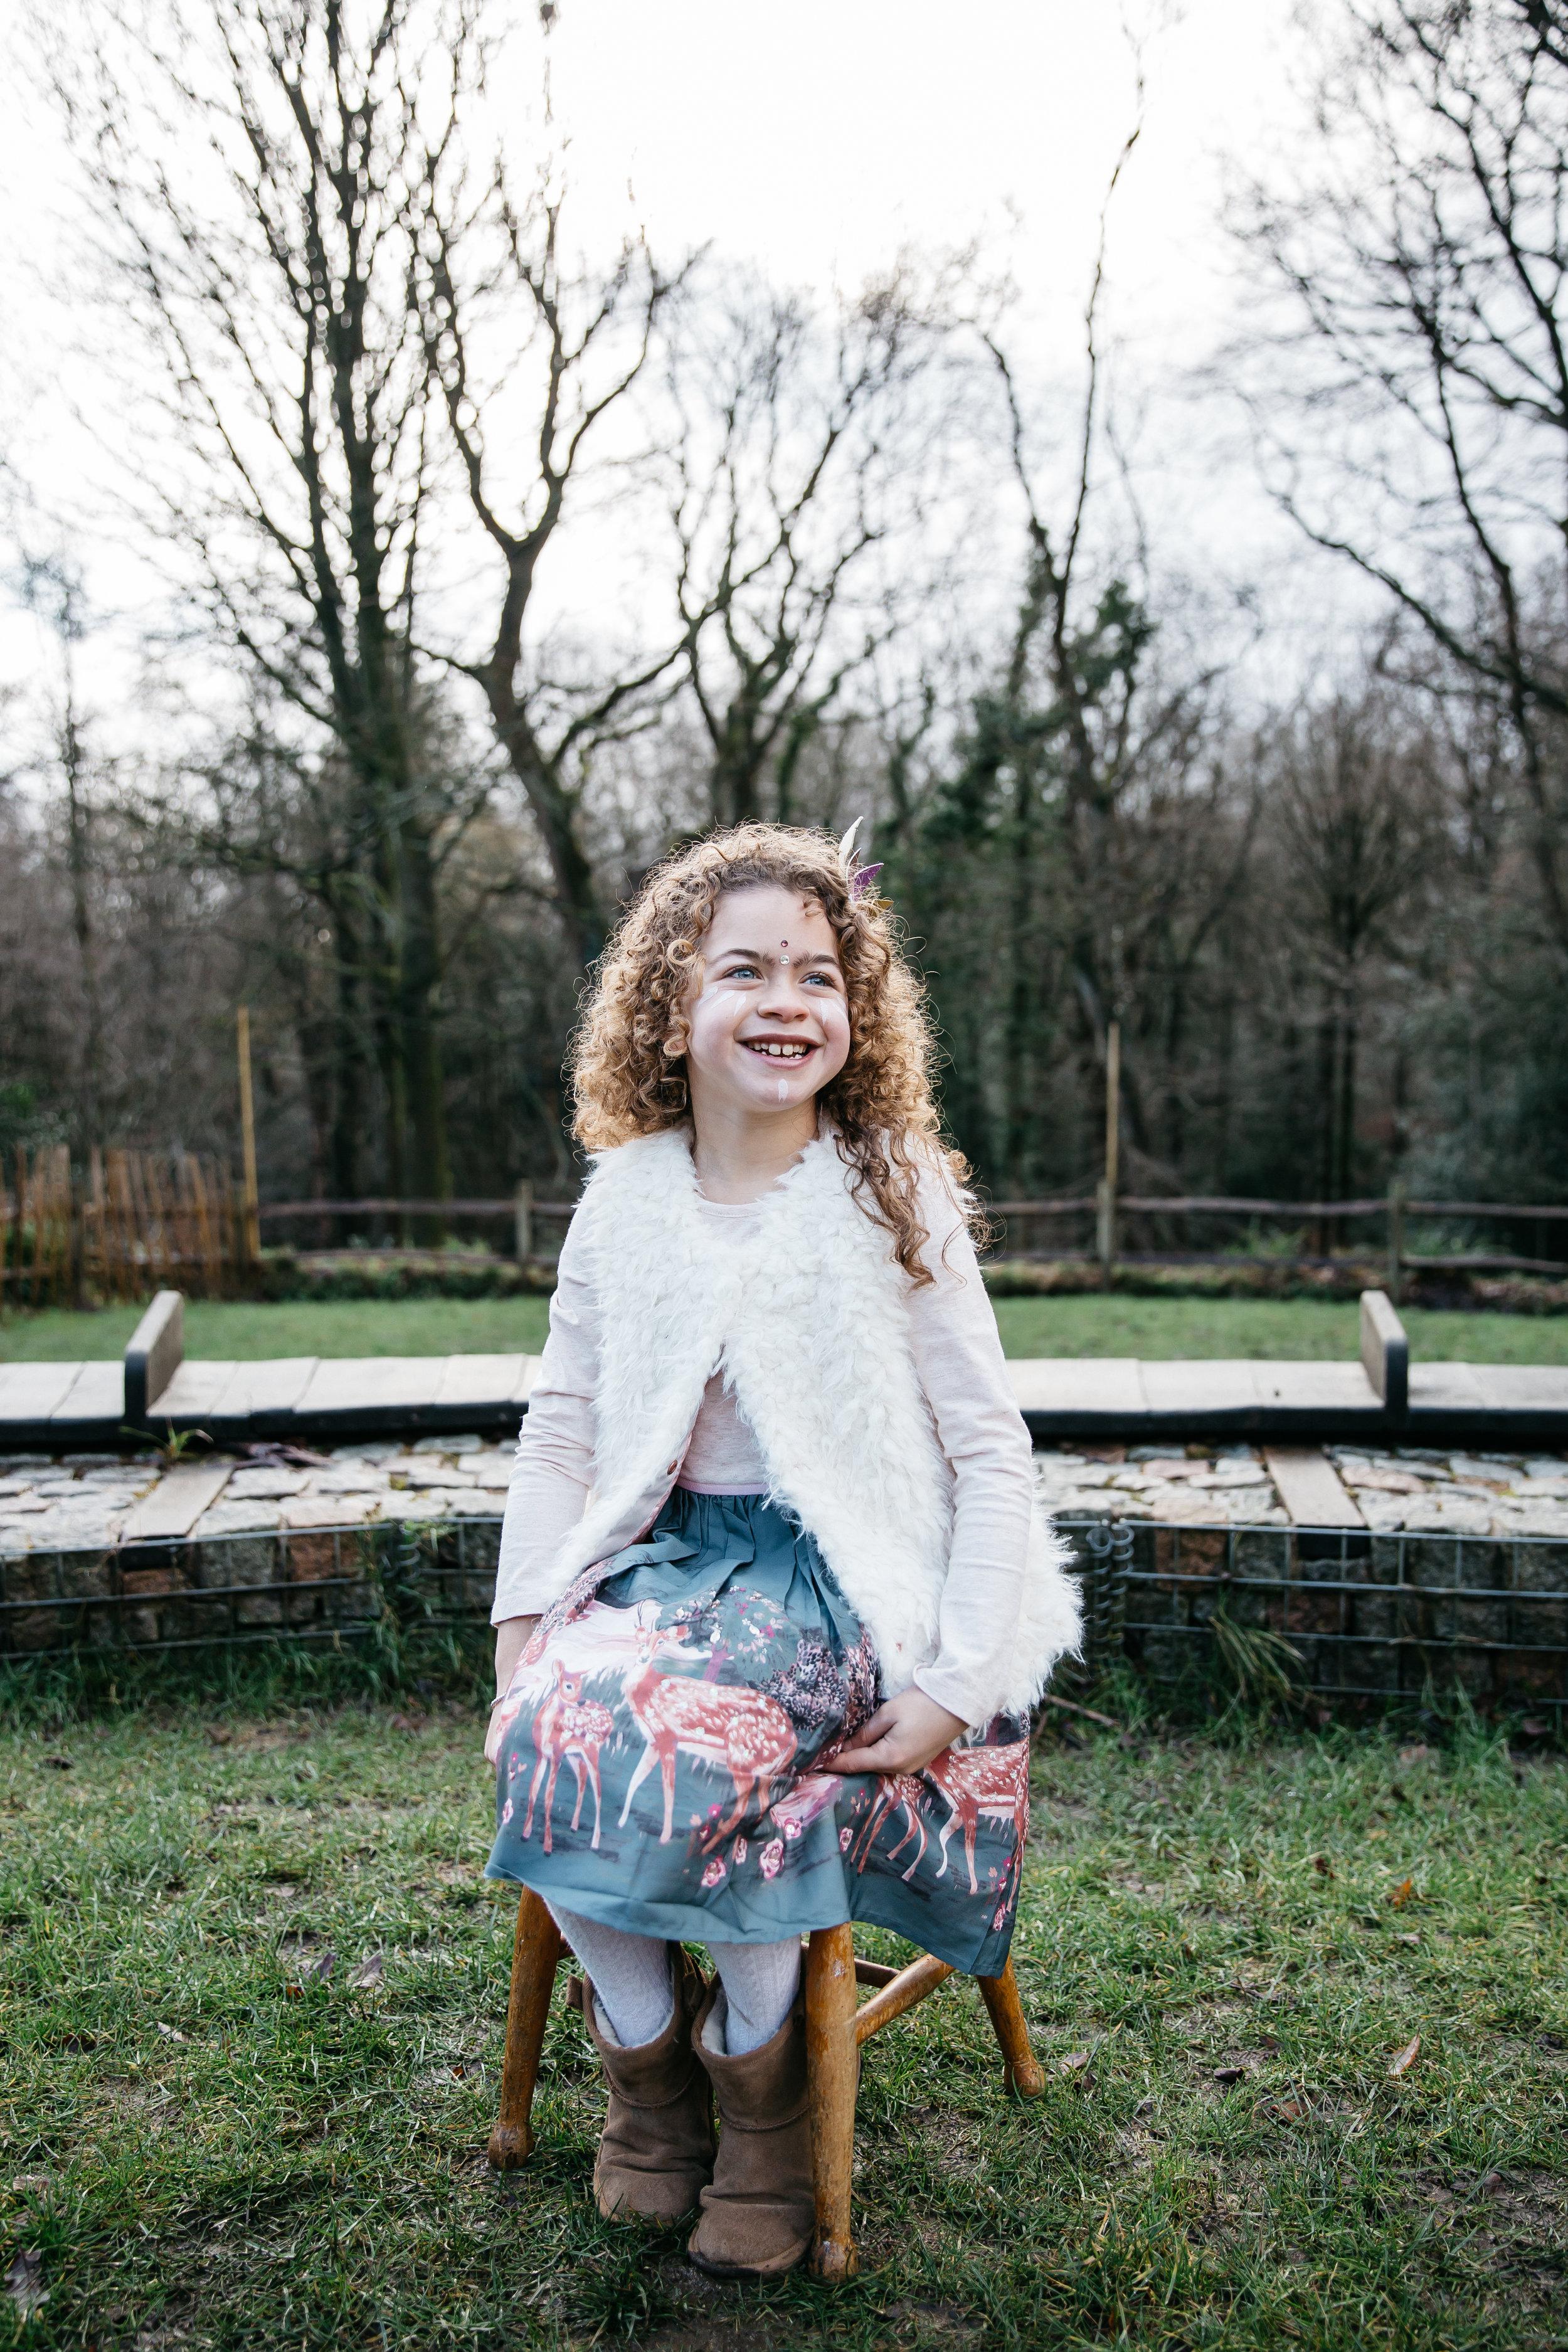 Nieve child model with GDD